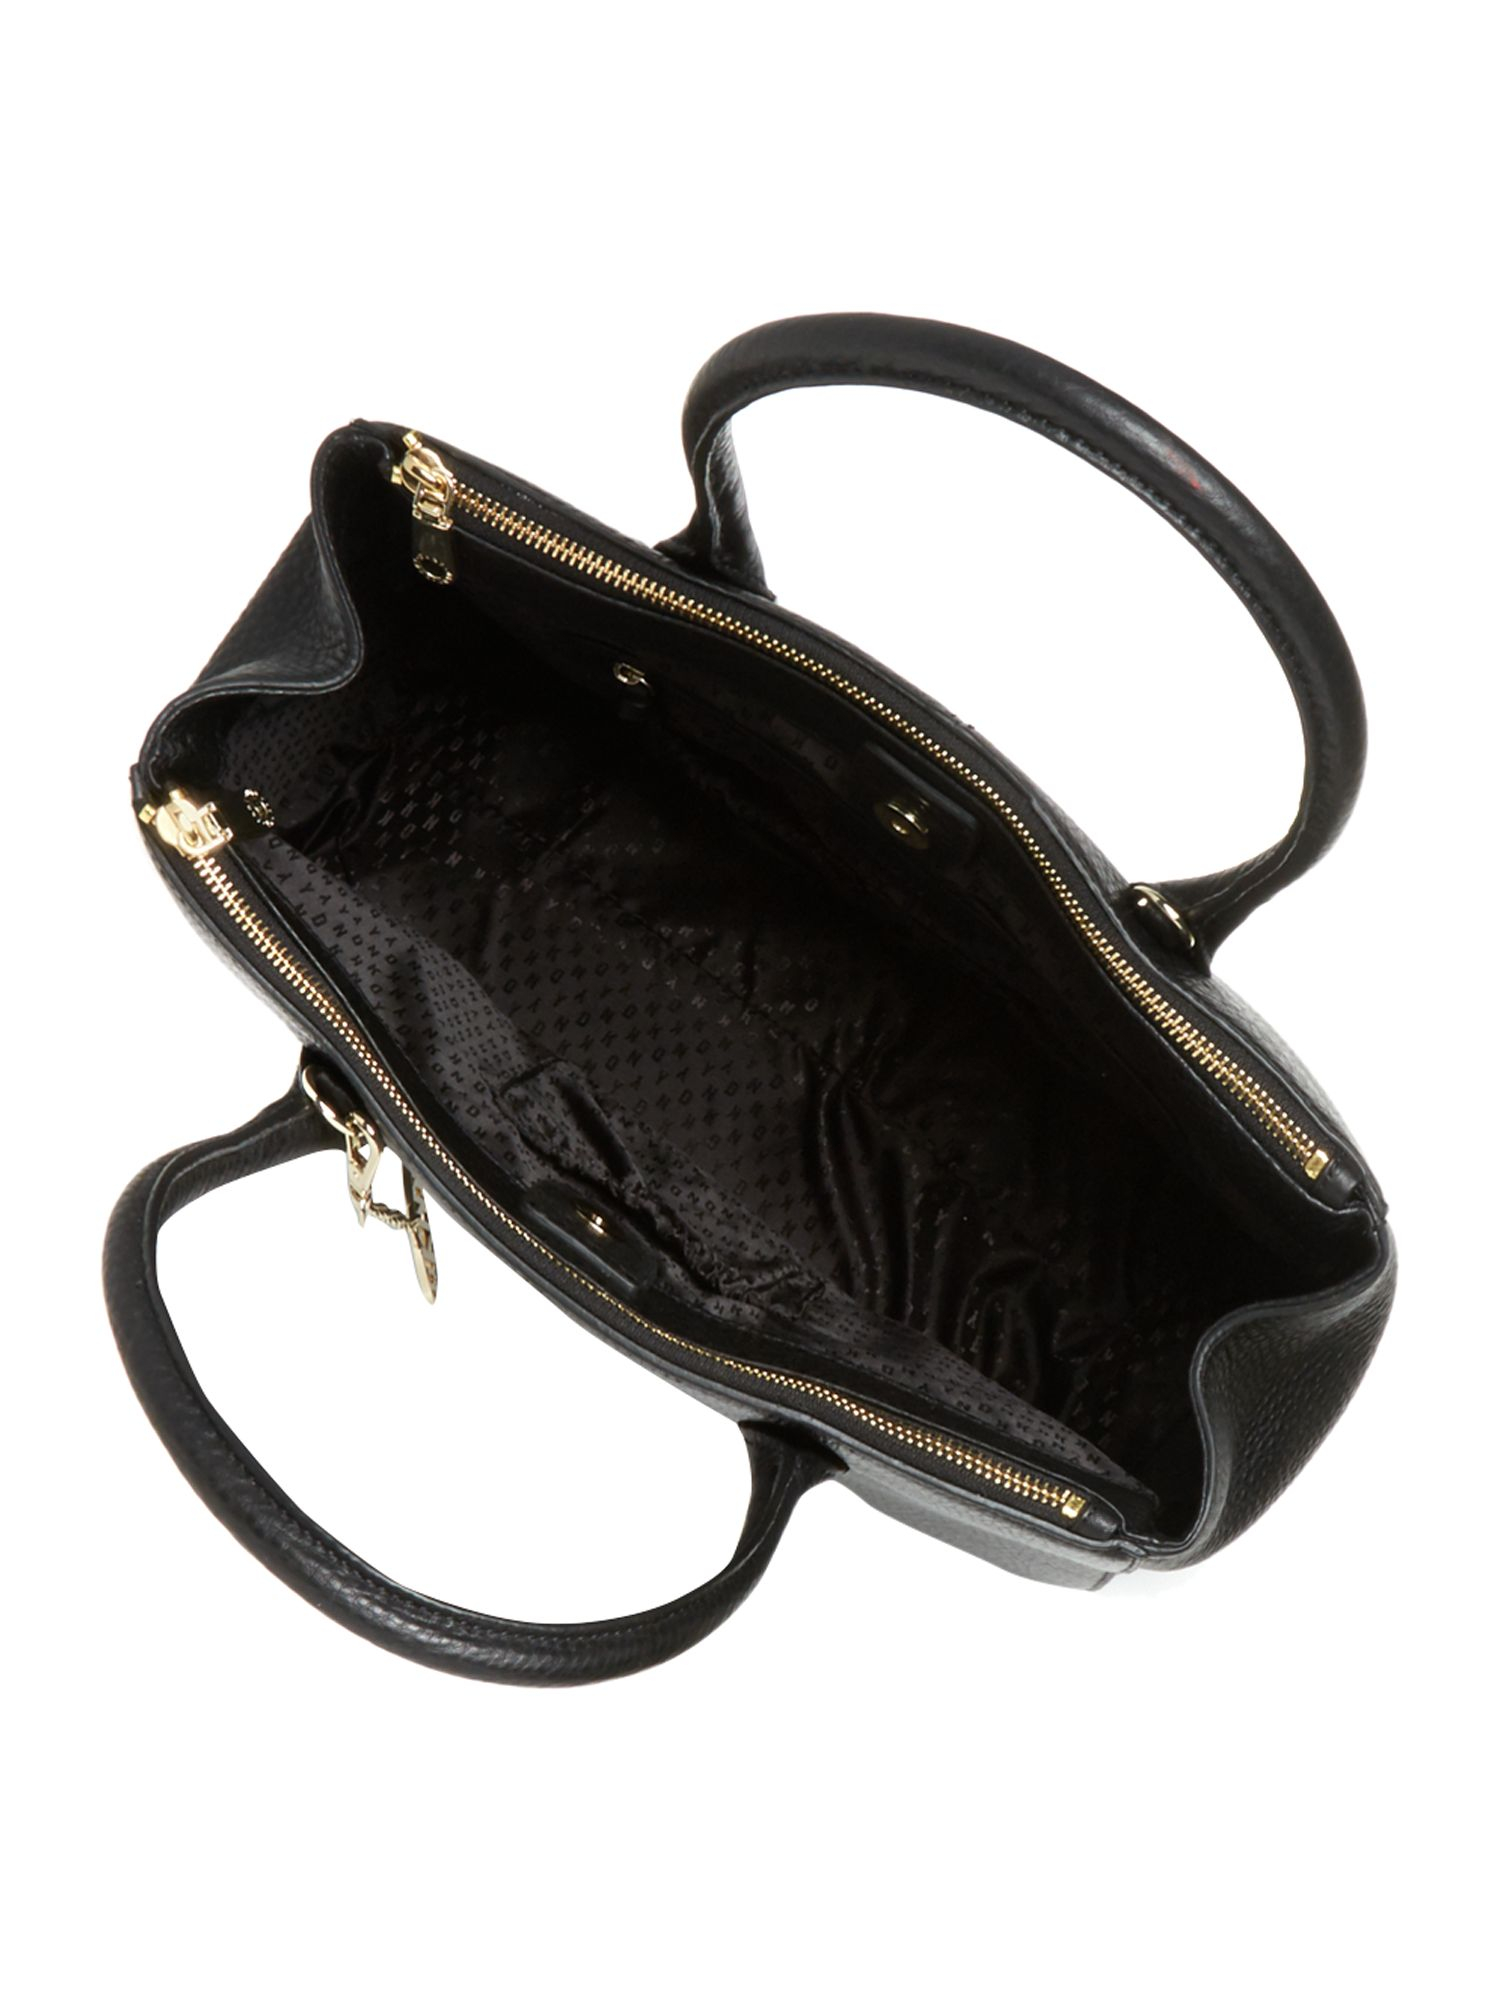 Dkny Tribeca Black Double Zip Tote Bag in Black | Lyst